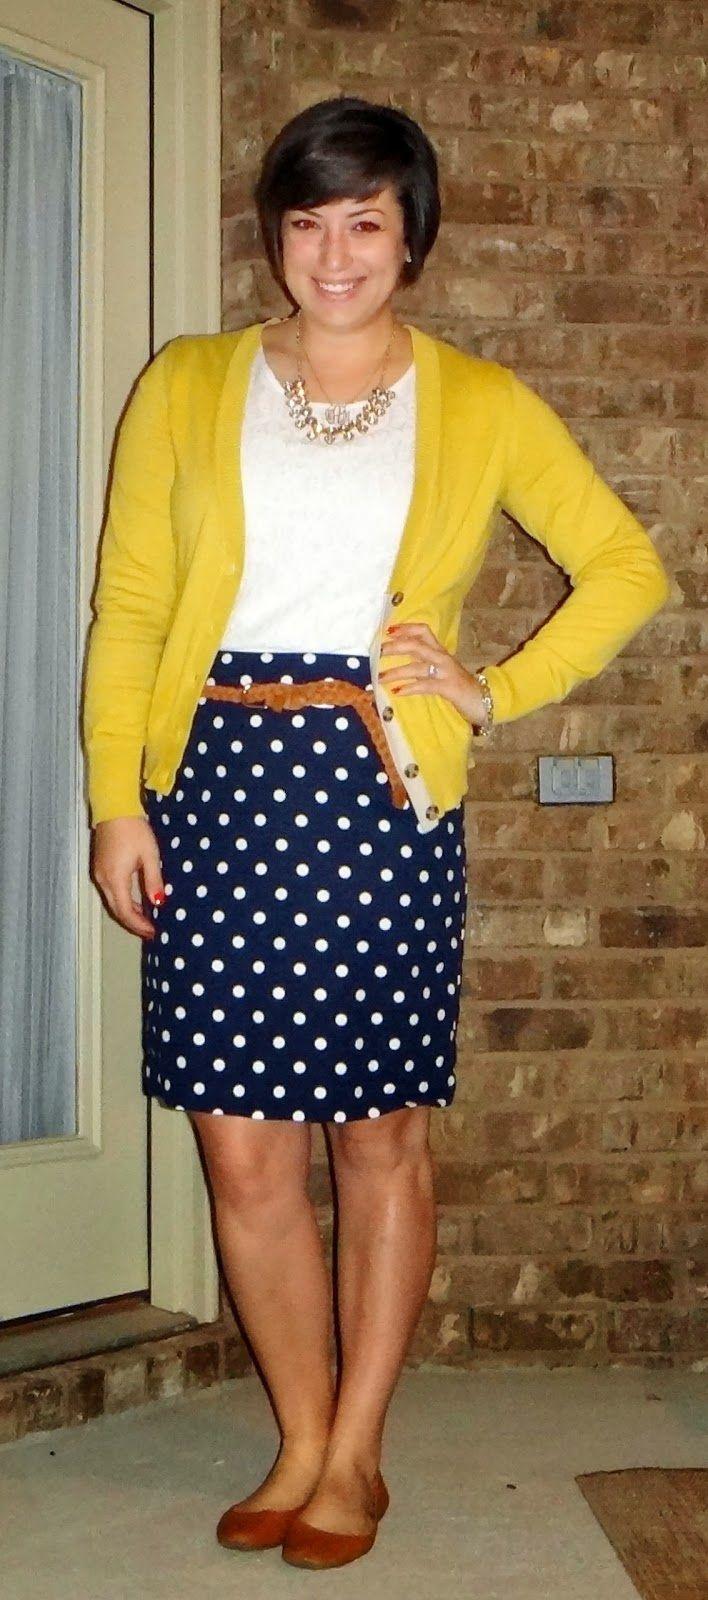 Yellow cardigan, white tee, navy skirt w/ white polka dots, lt. brown belt, brown shoes